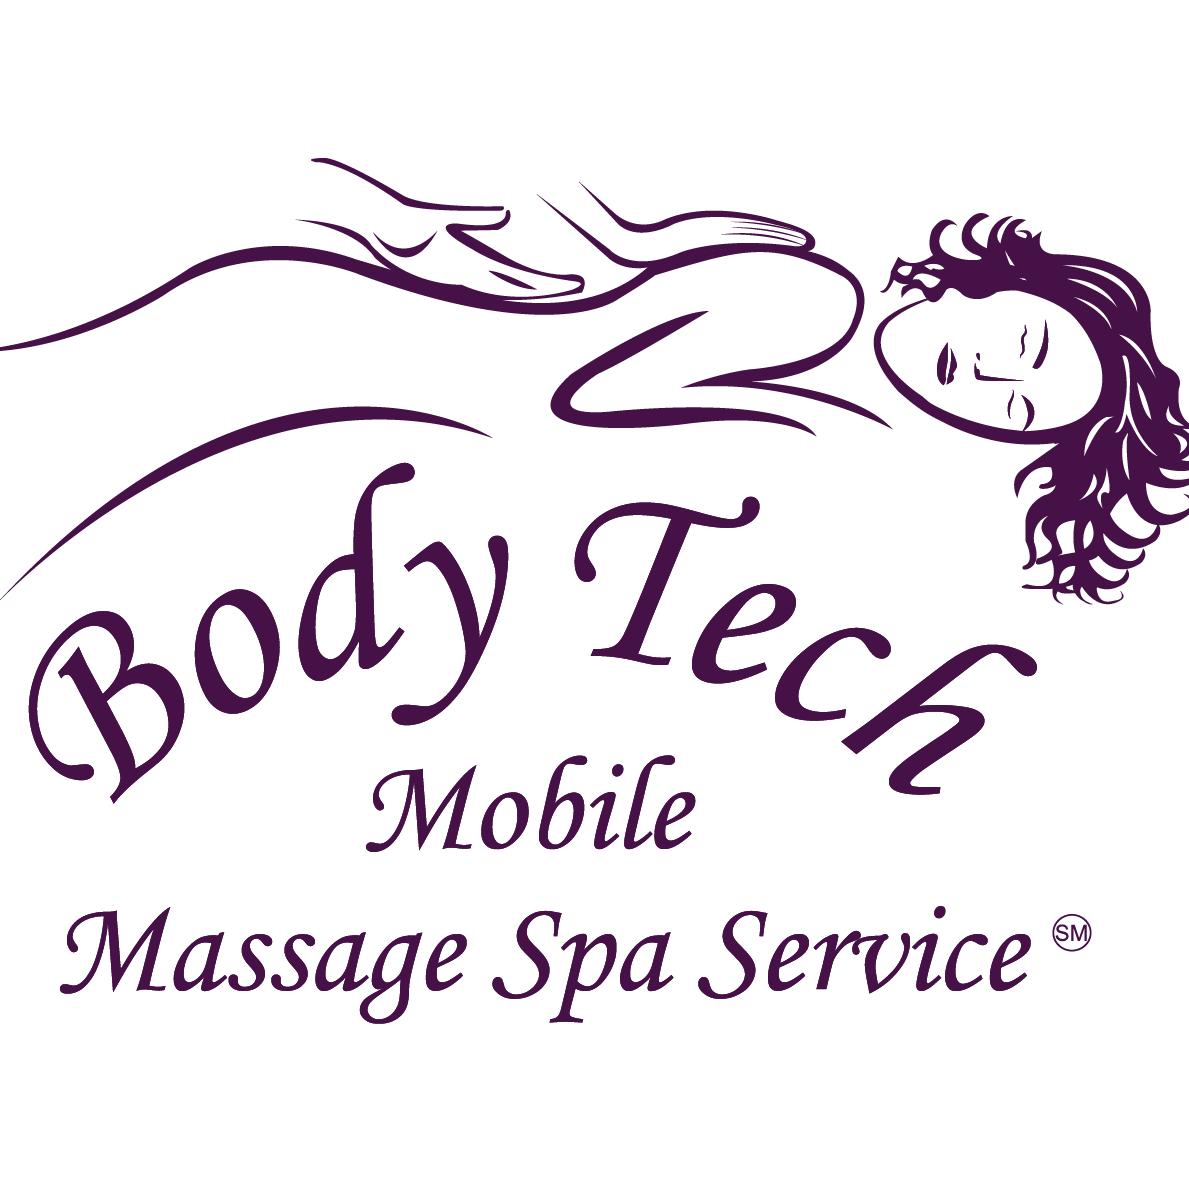 Body Tech Mobile Massage Spa Services - Jacksonville, FL - Spas